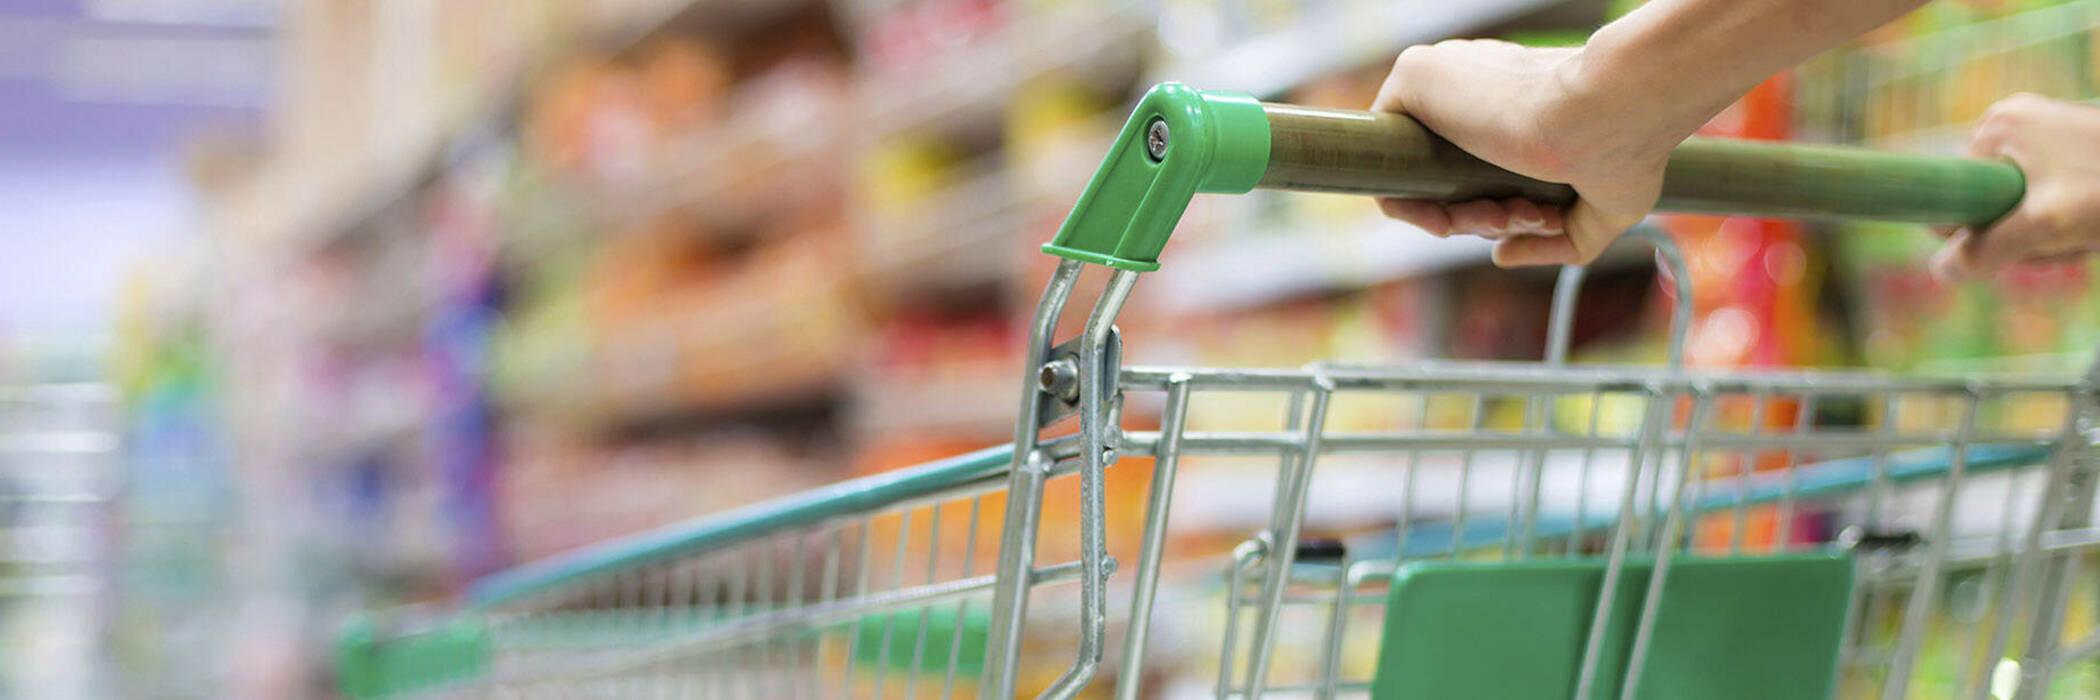 15nov supermarket price survey hero